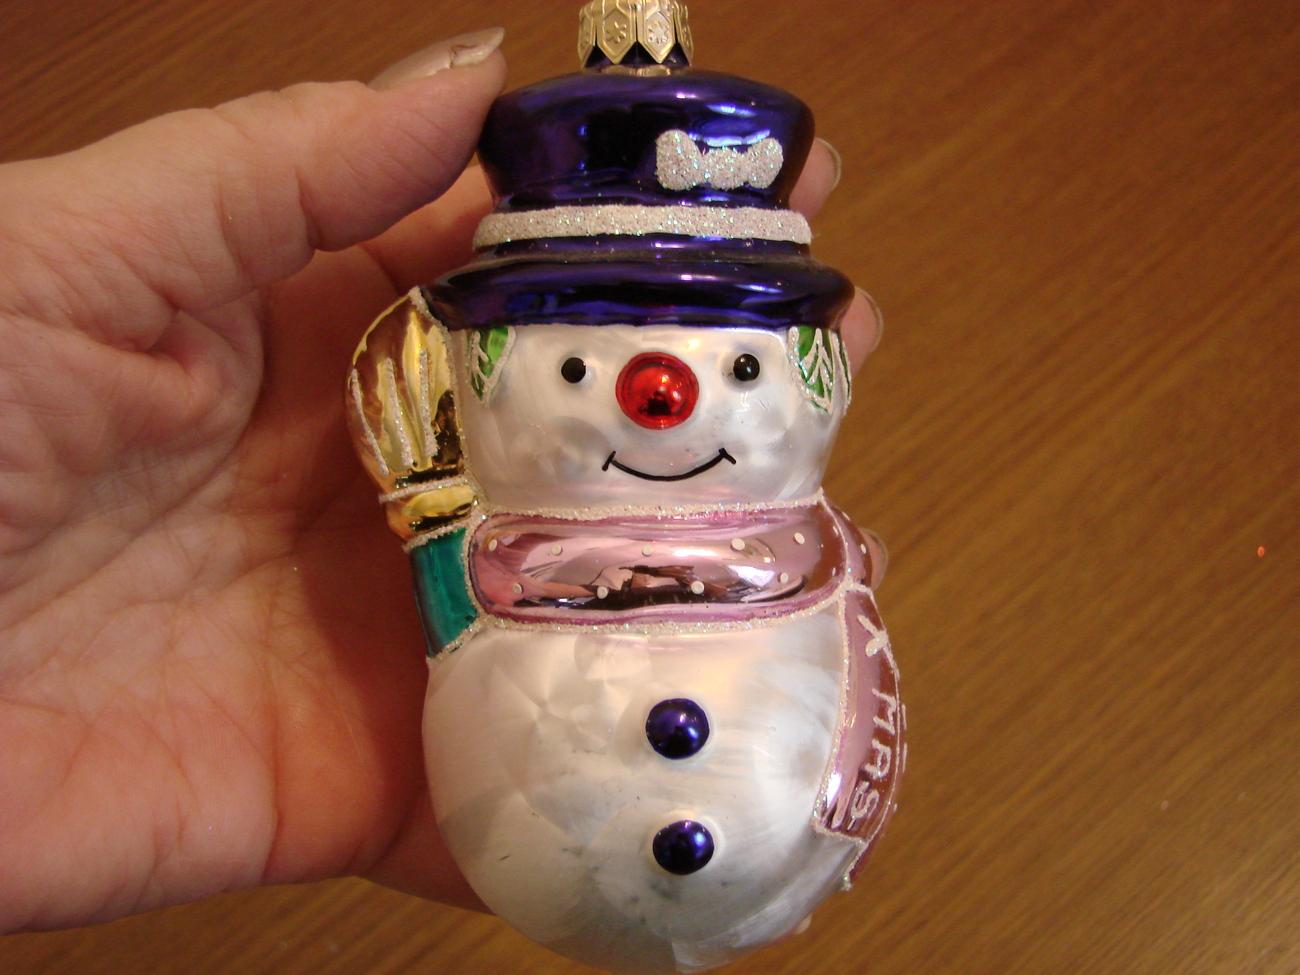 Blown Glass Xmas 2001 Snowman Ornament from Poland